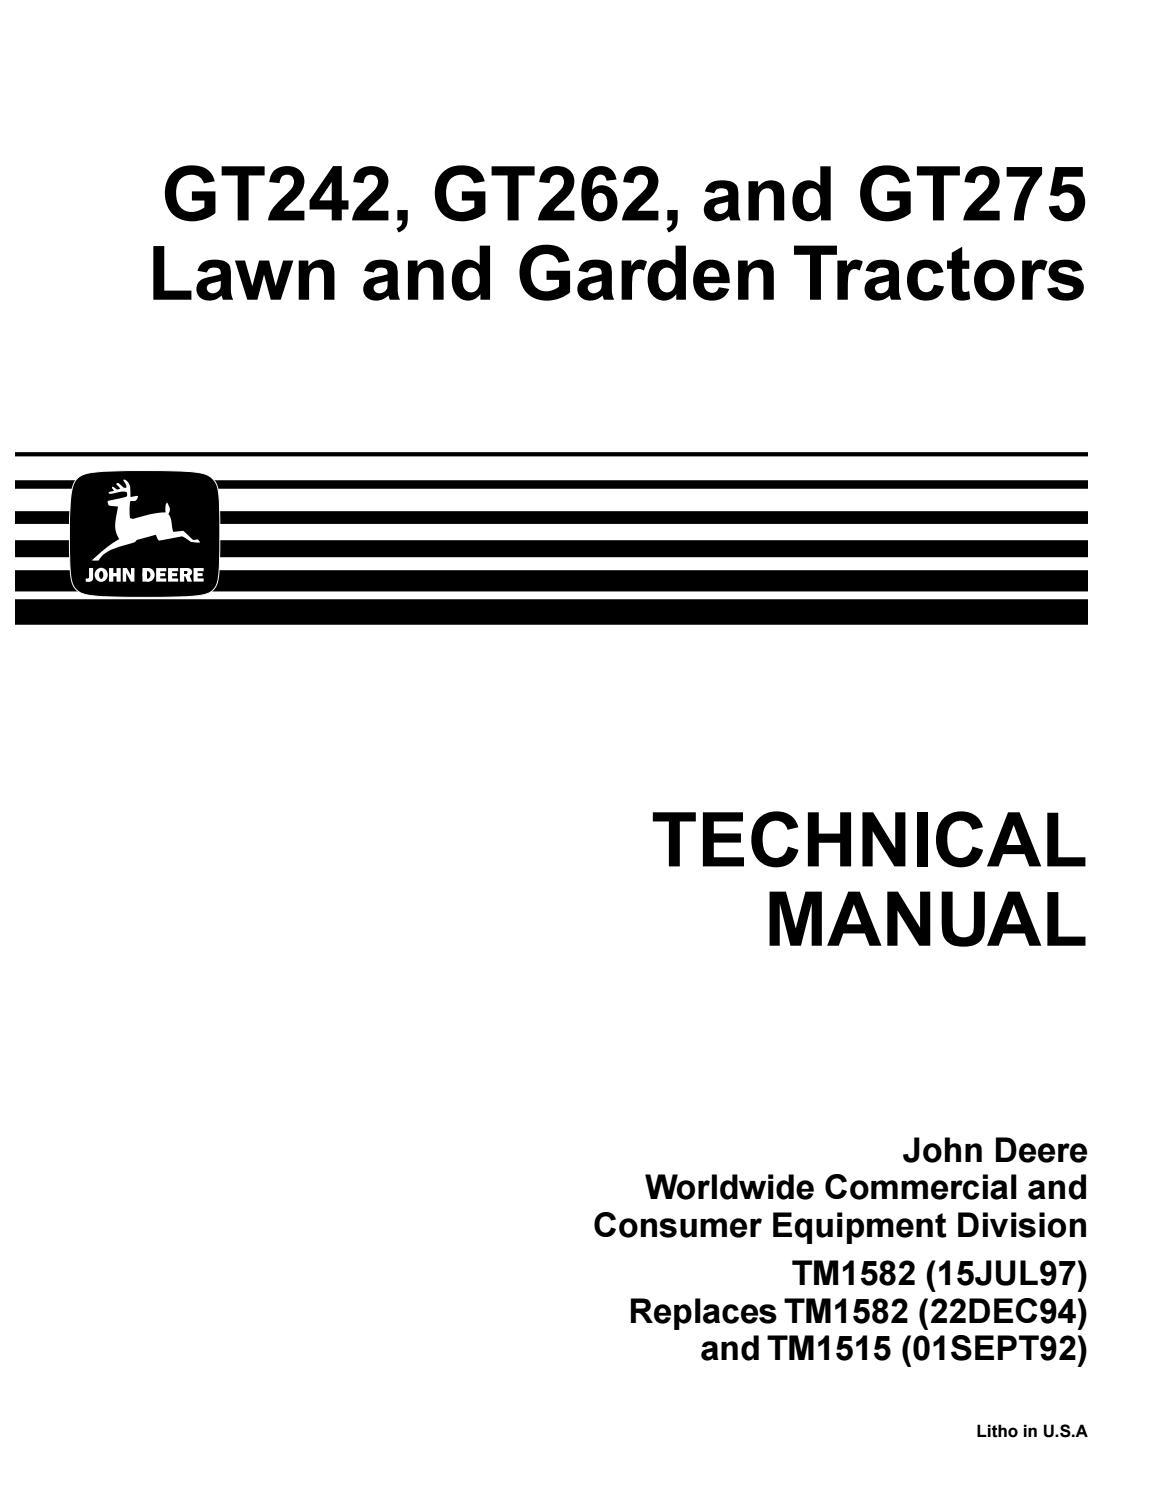 page_1 john deere gt262 lawn garden tractor service repair manual by